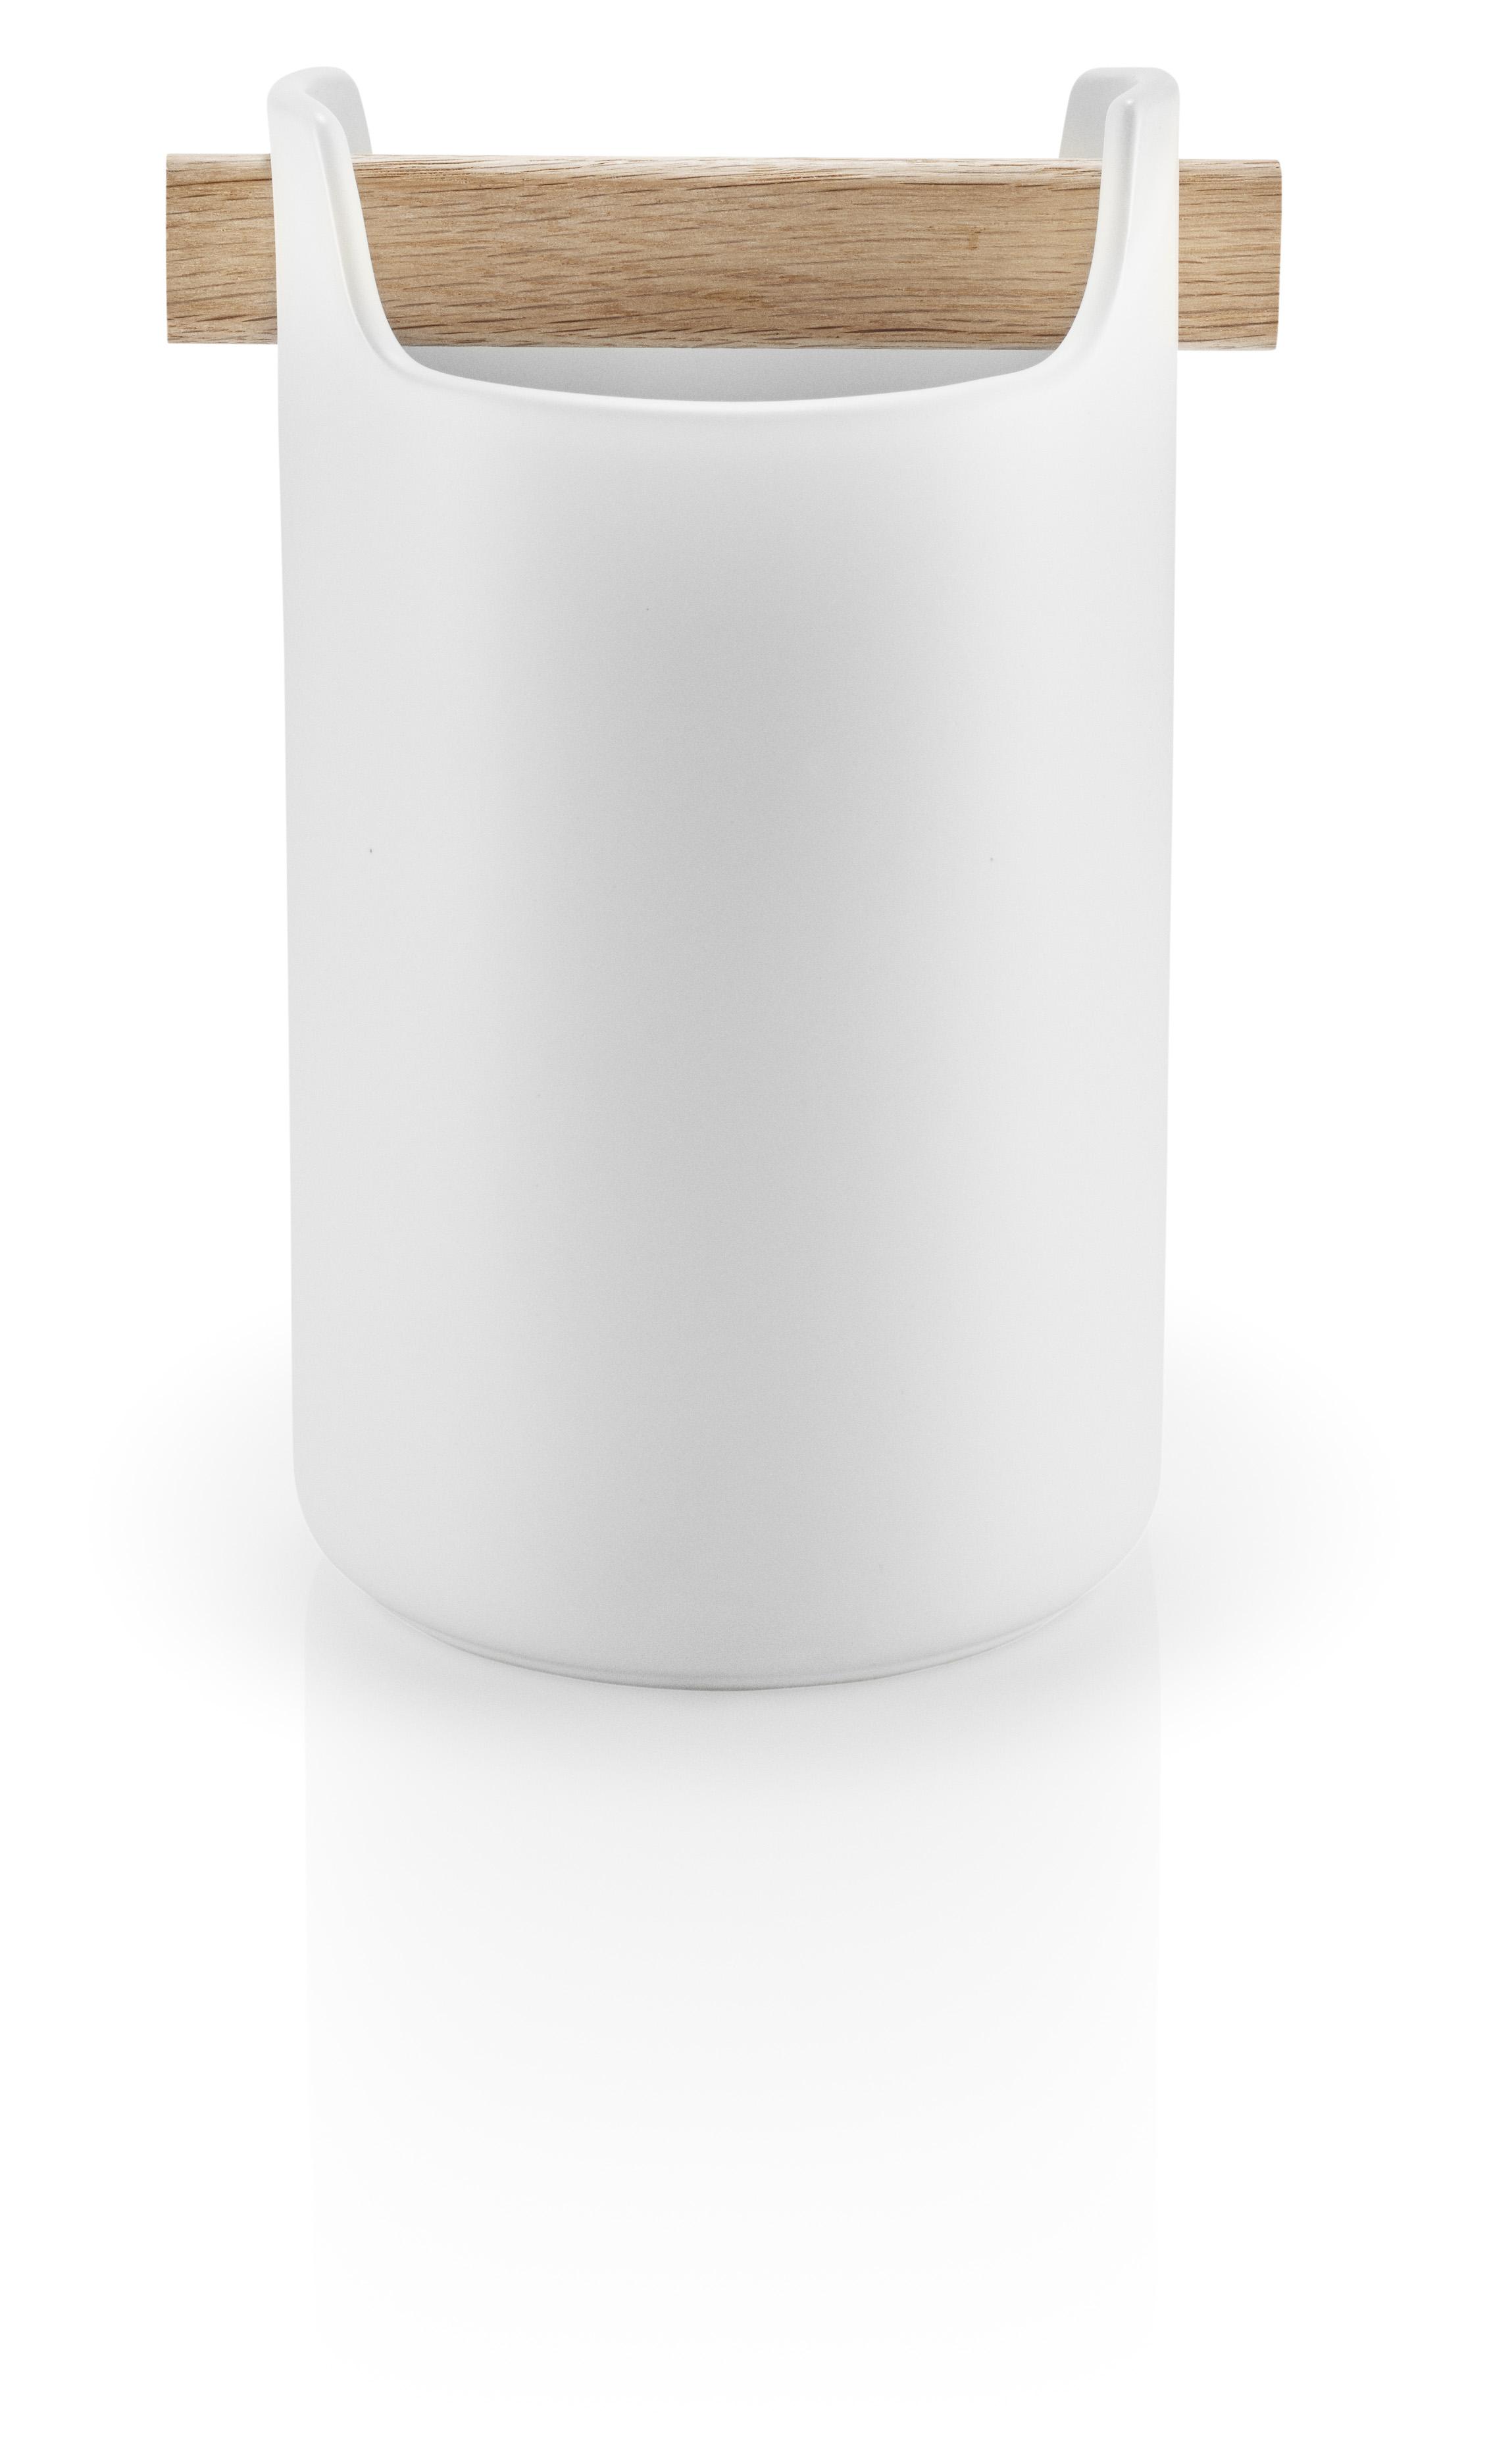 Eva Solo Redskapskruka Keramik 20 cm